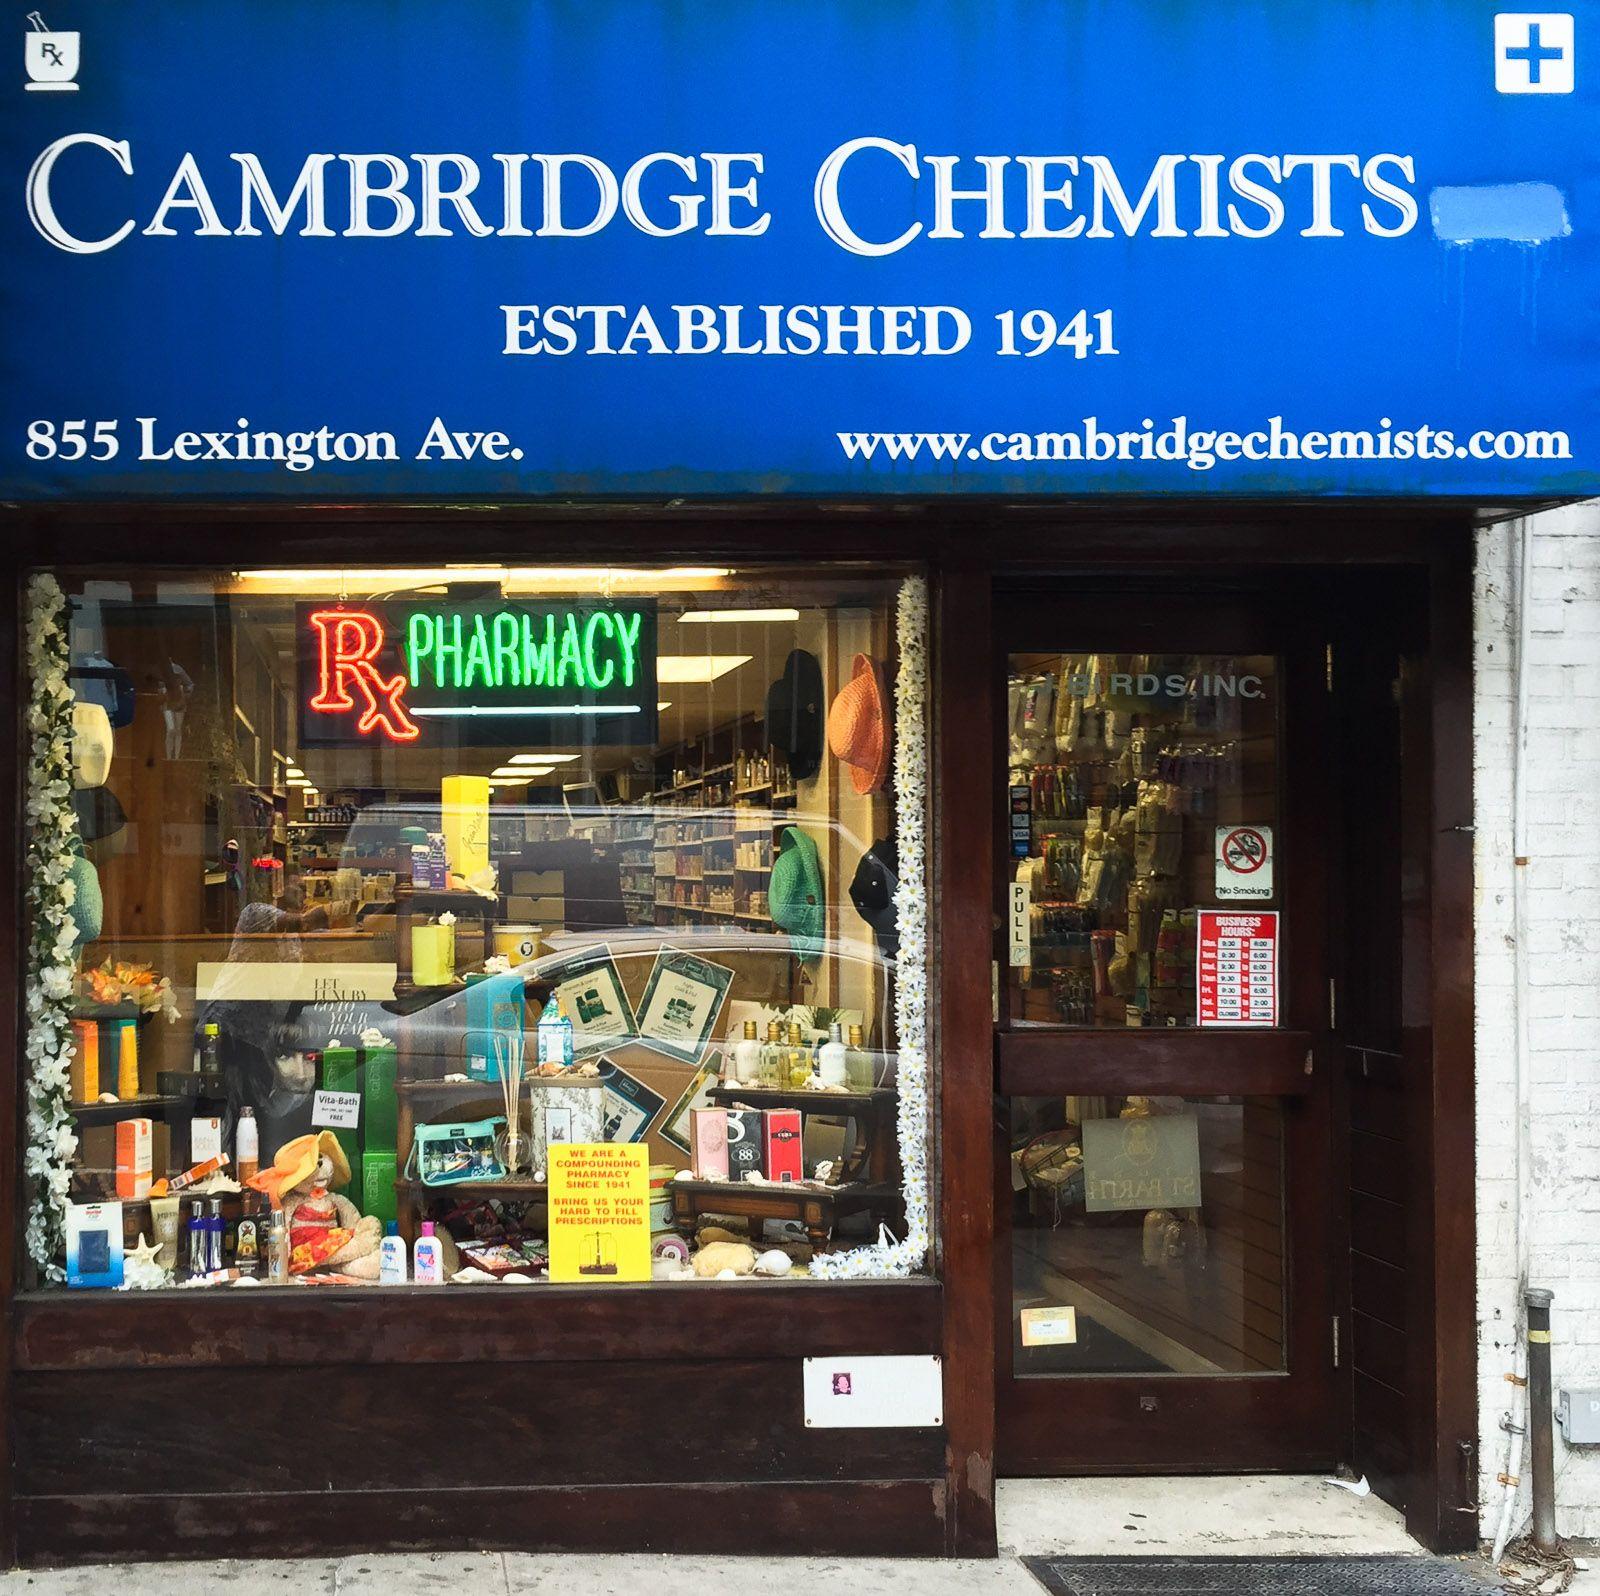 Drogeria Cambridge Chemists (855 Lexington Avenue, New York, USA)